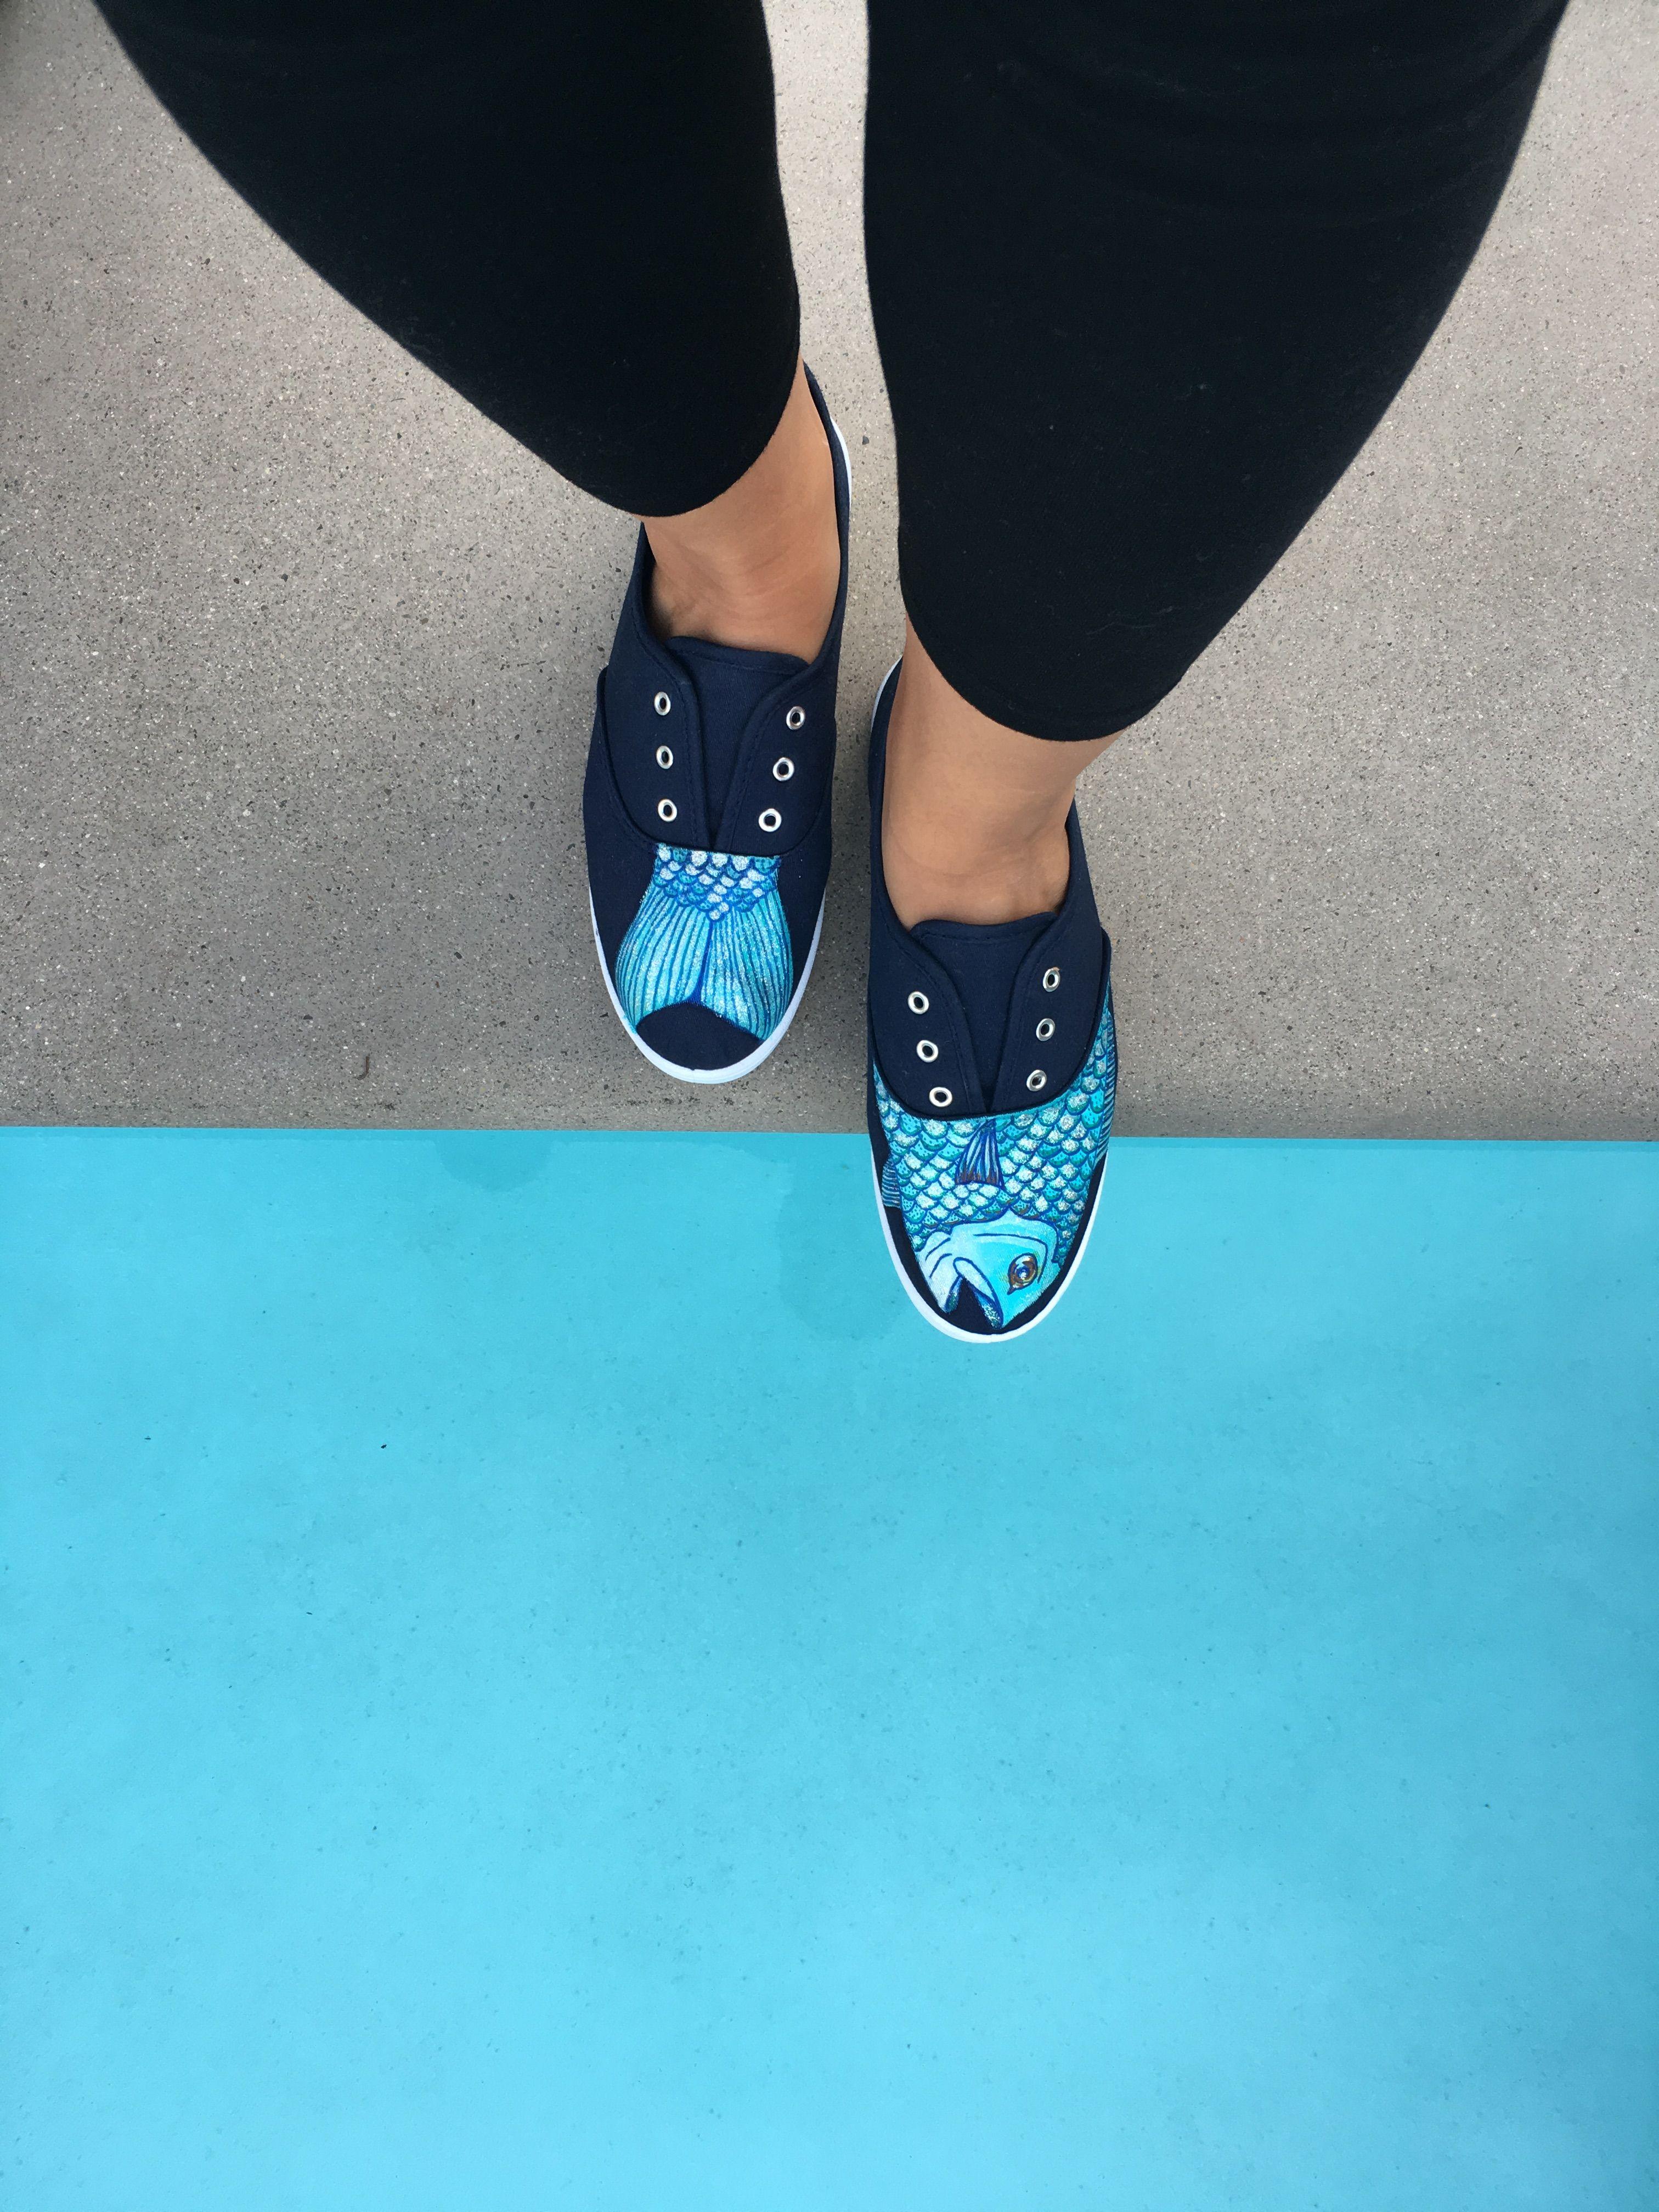 Follow @saba_shoes on ig